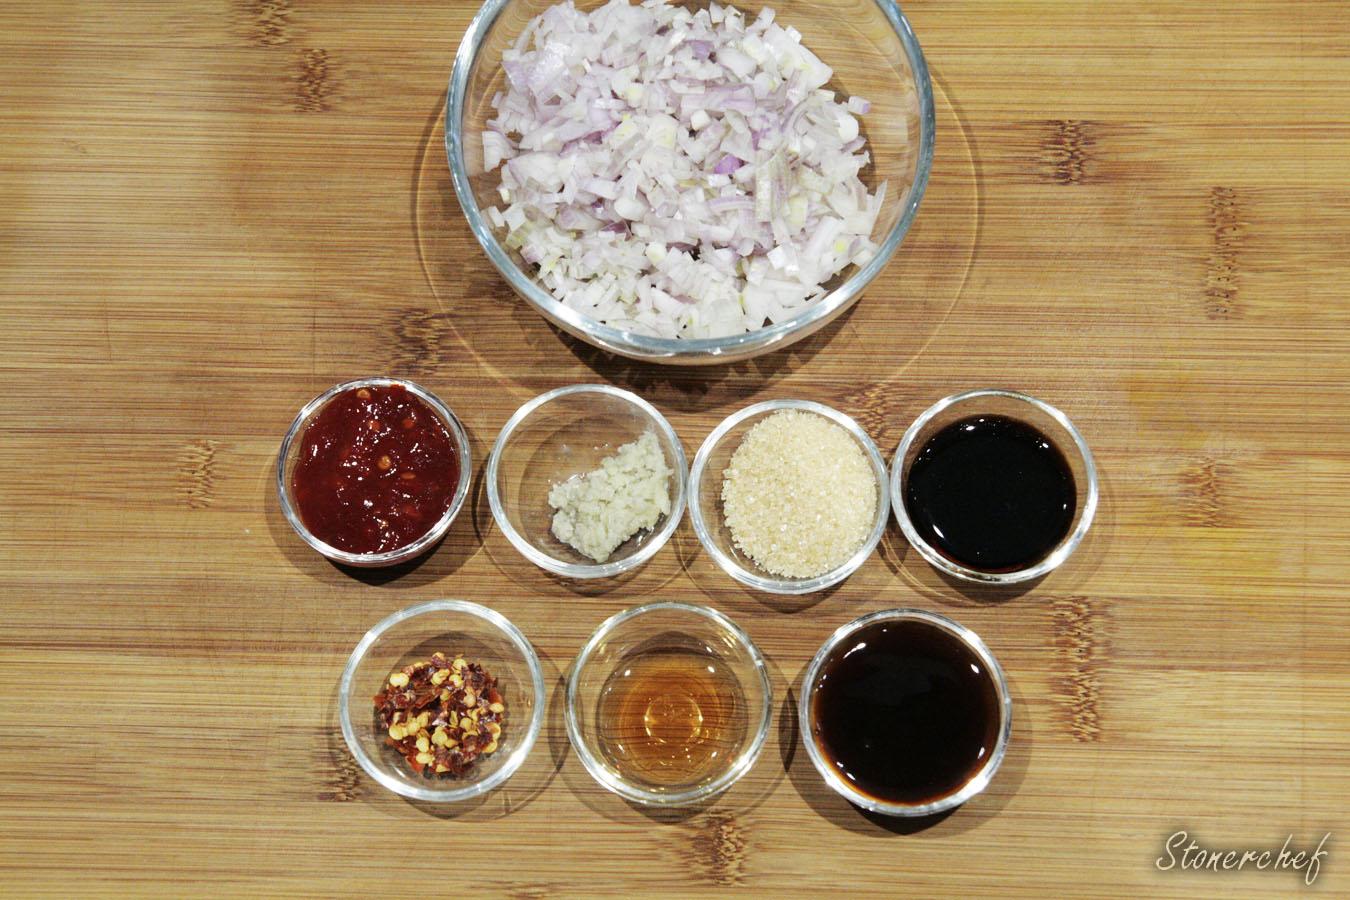 składniki na dip z sambalem